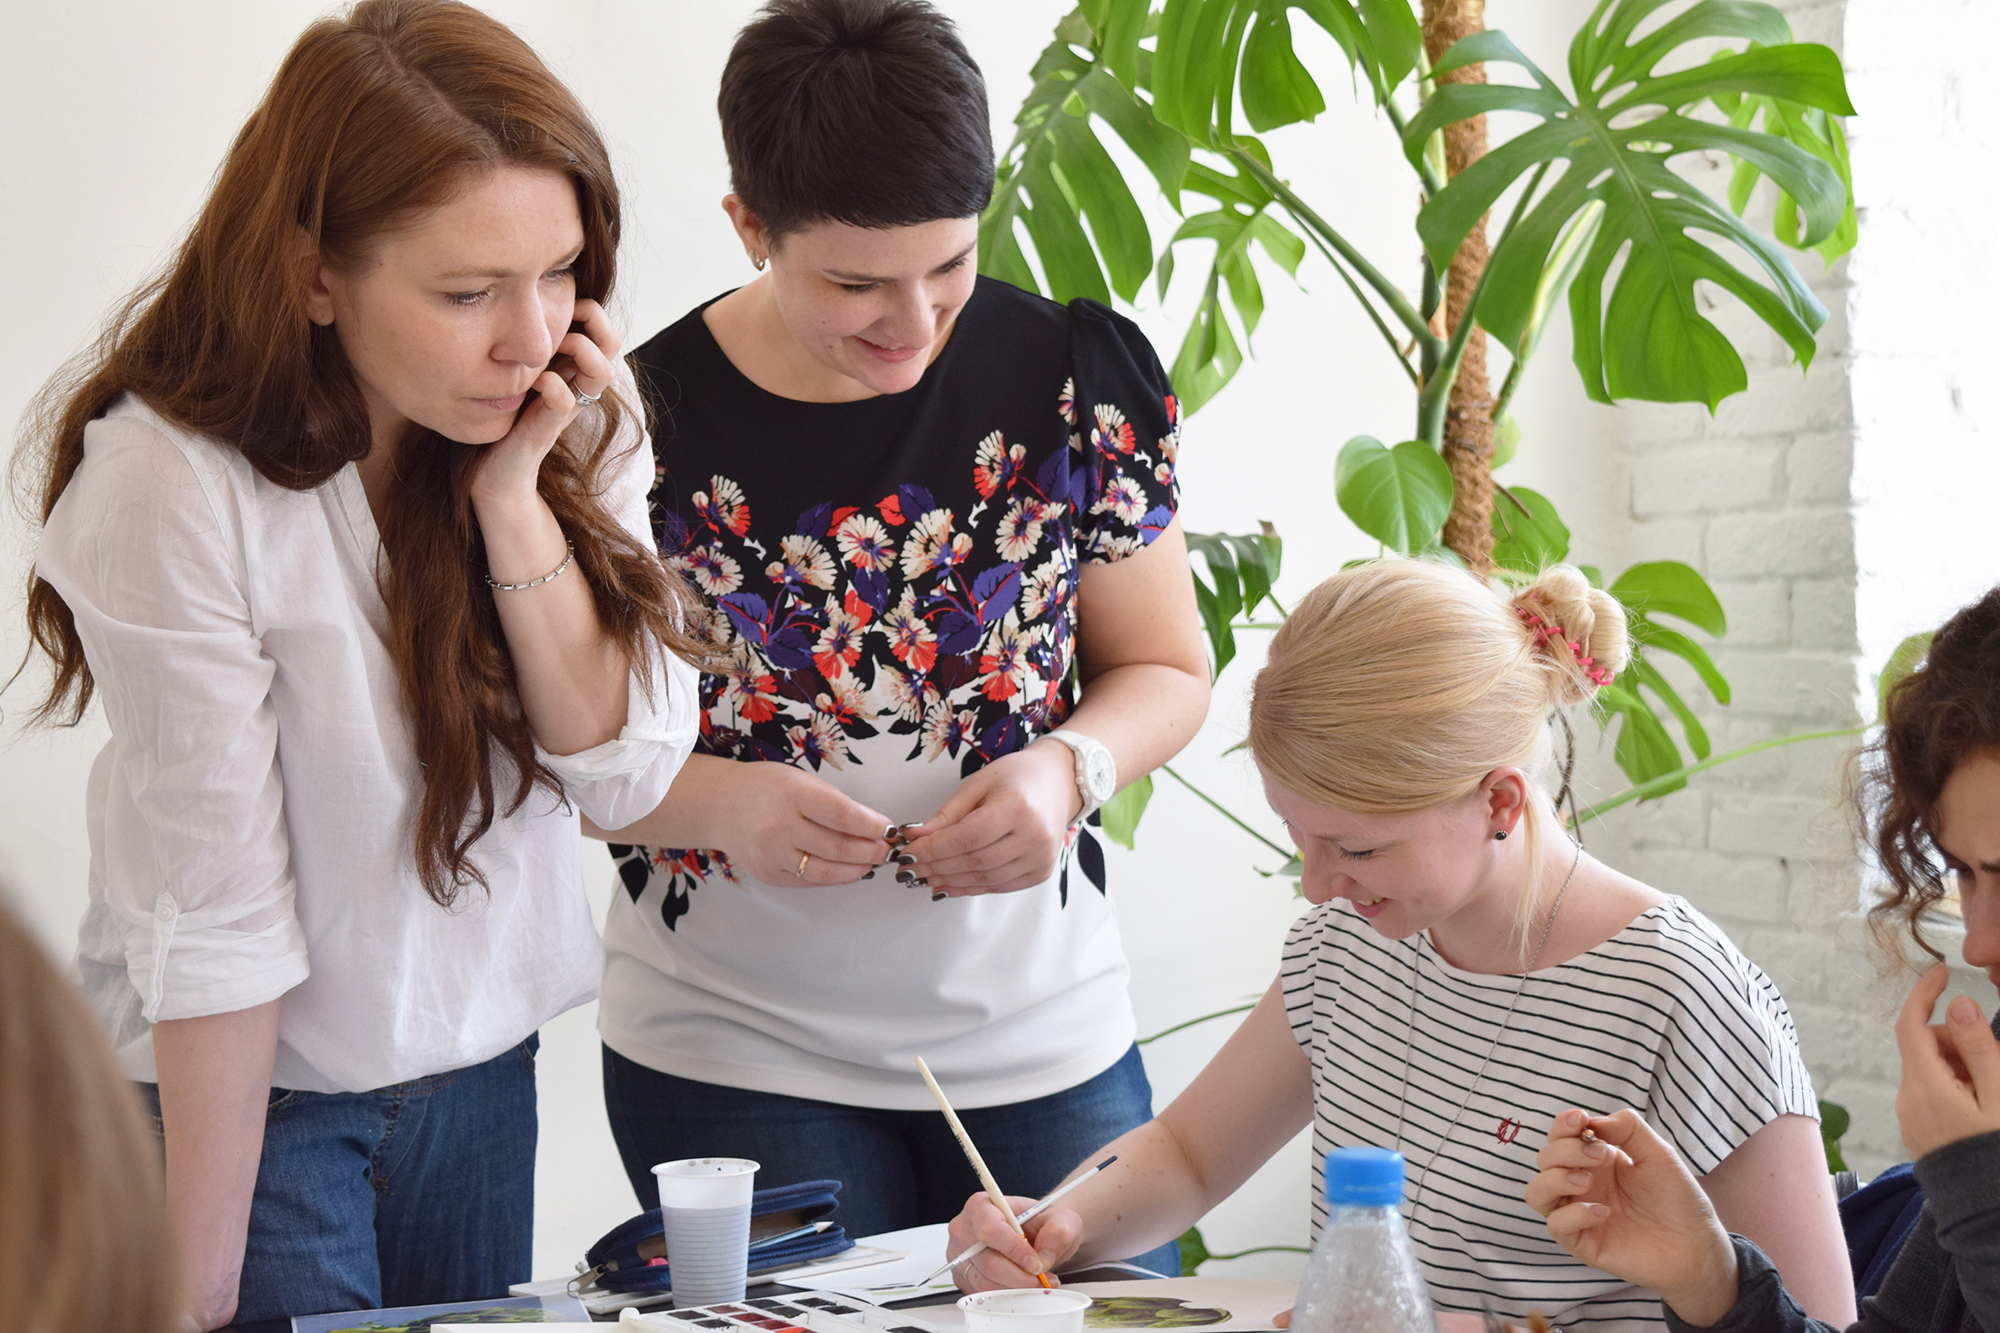 ОТ УМА House / аренда зала в Москве